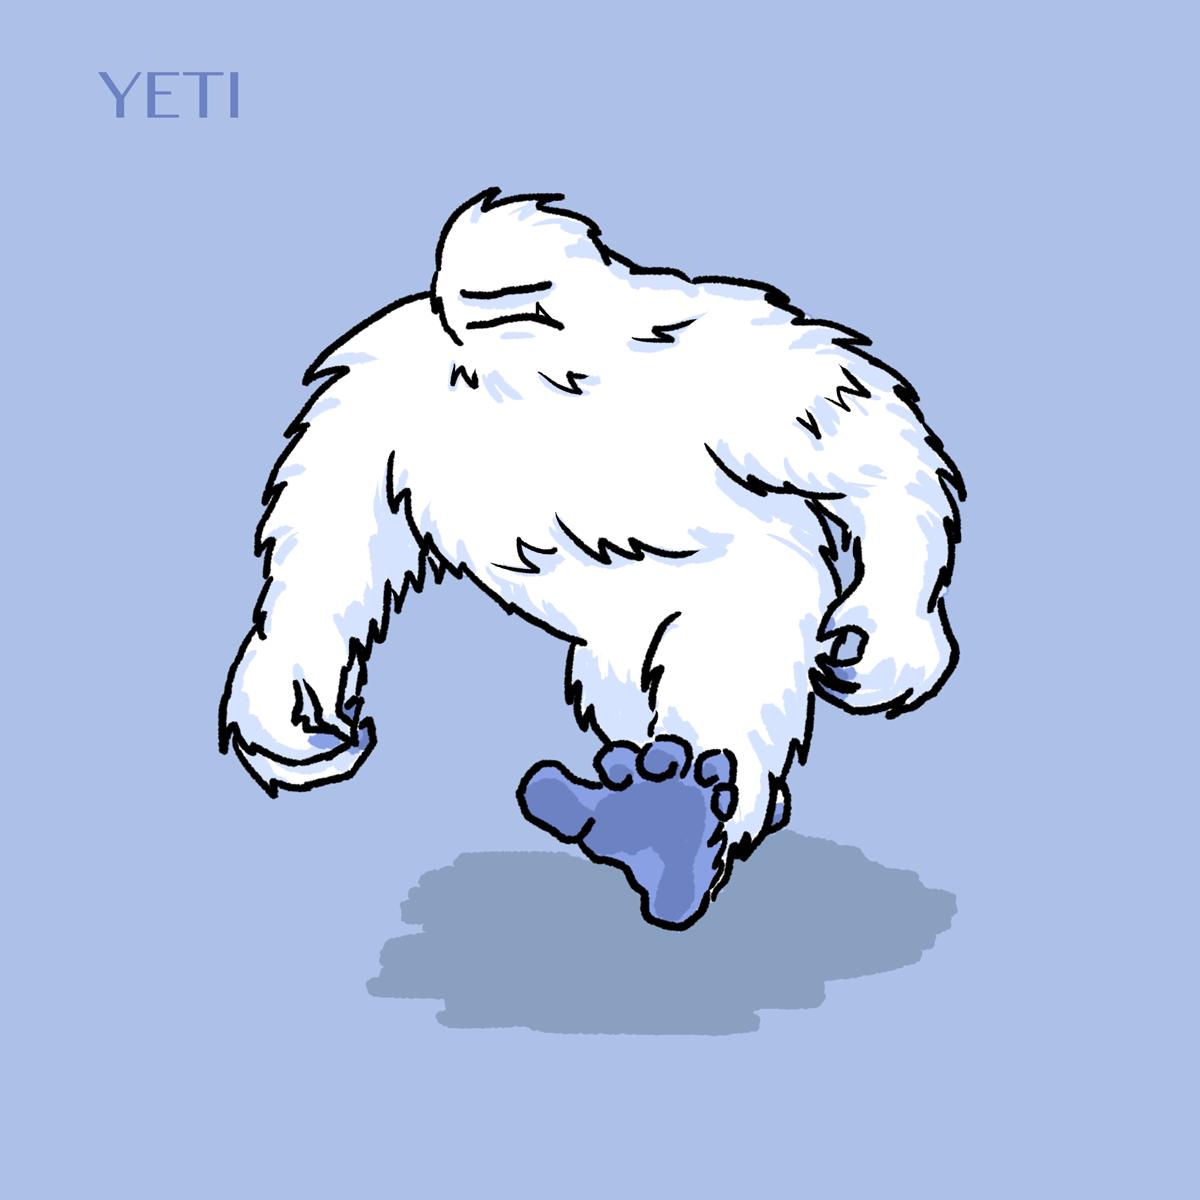 yeti images - usseek.com